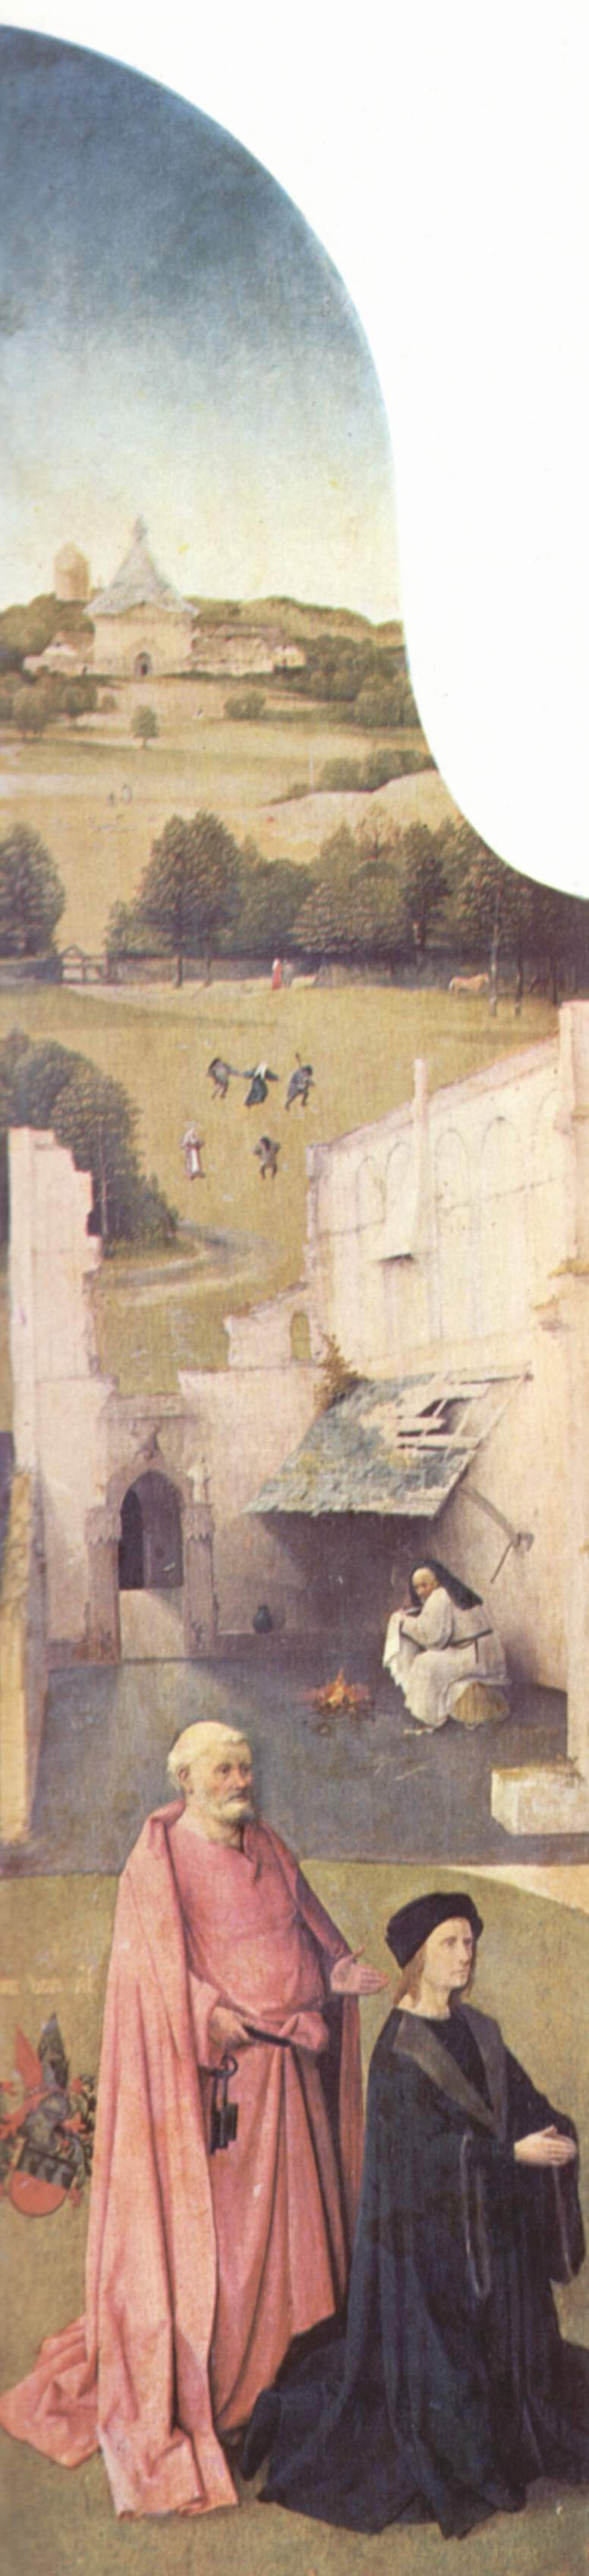 Hl. Petrus und kniender Stifter. English Title - Saint Peter and donor. Nederlands: De H. Petrus met stichter. | Hieronymus Bosch | oil painting